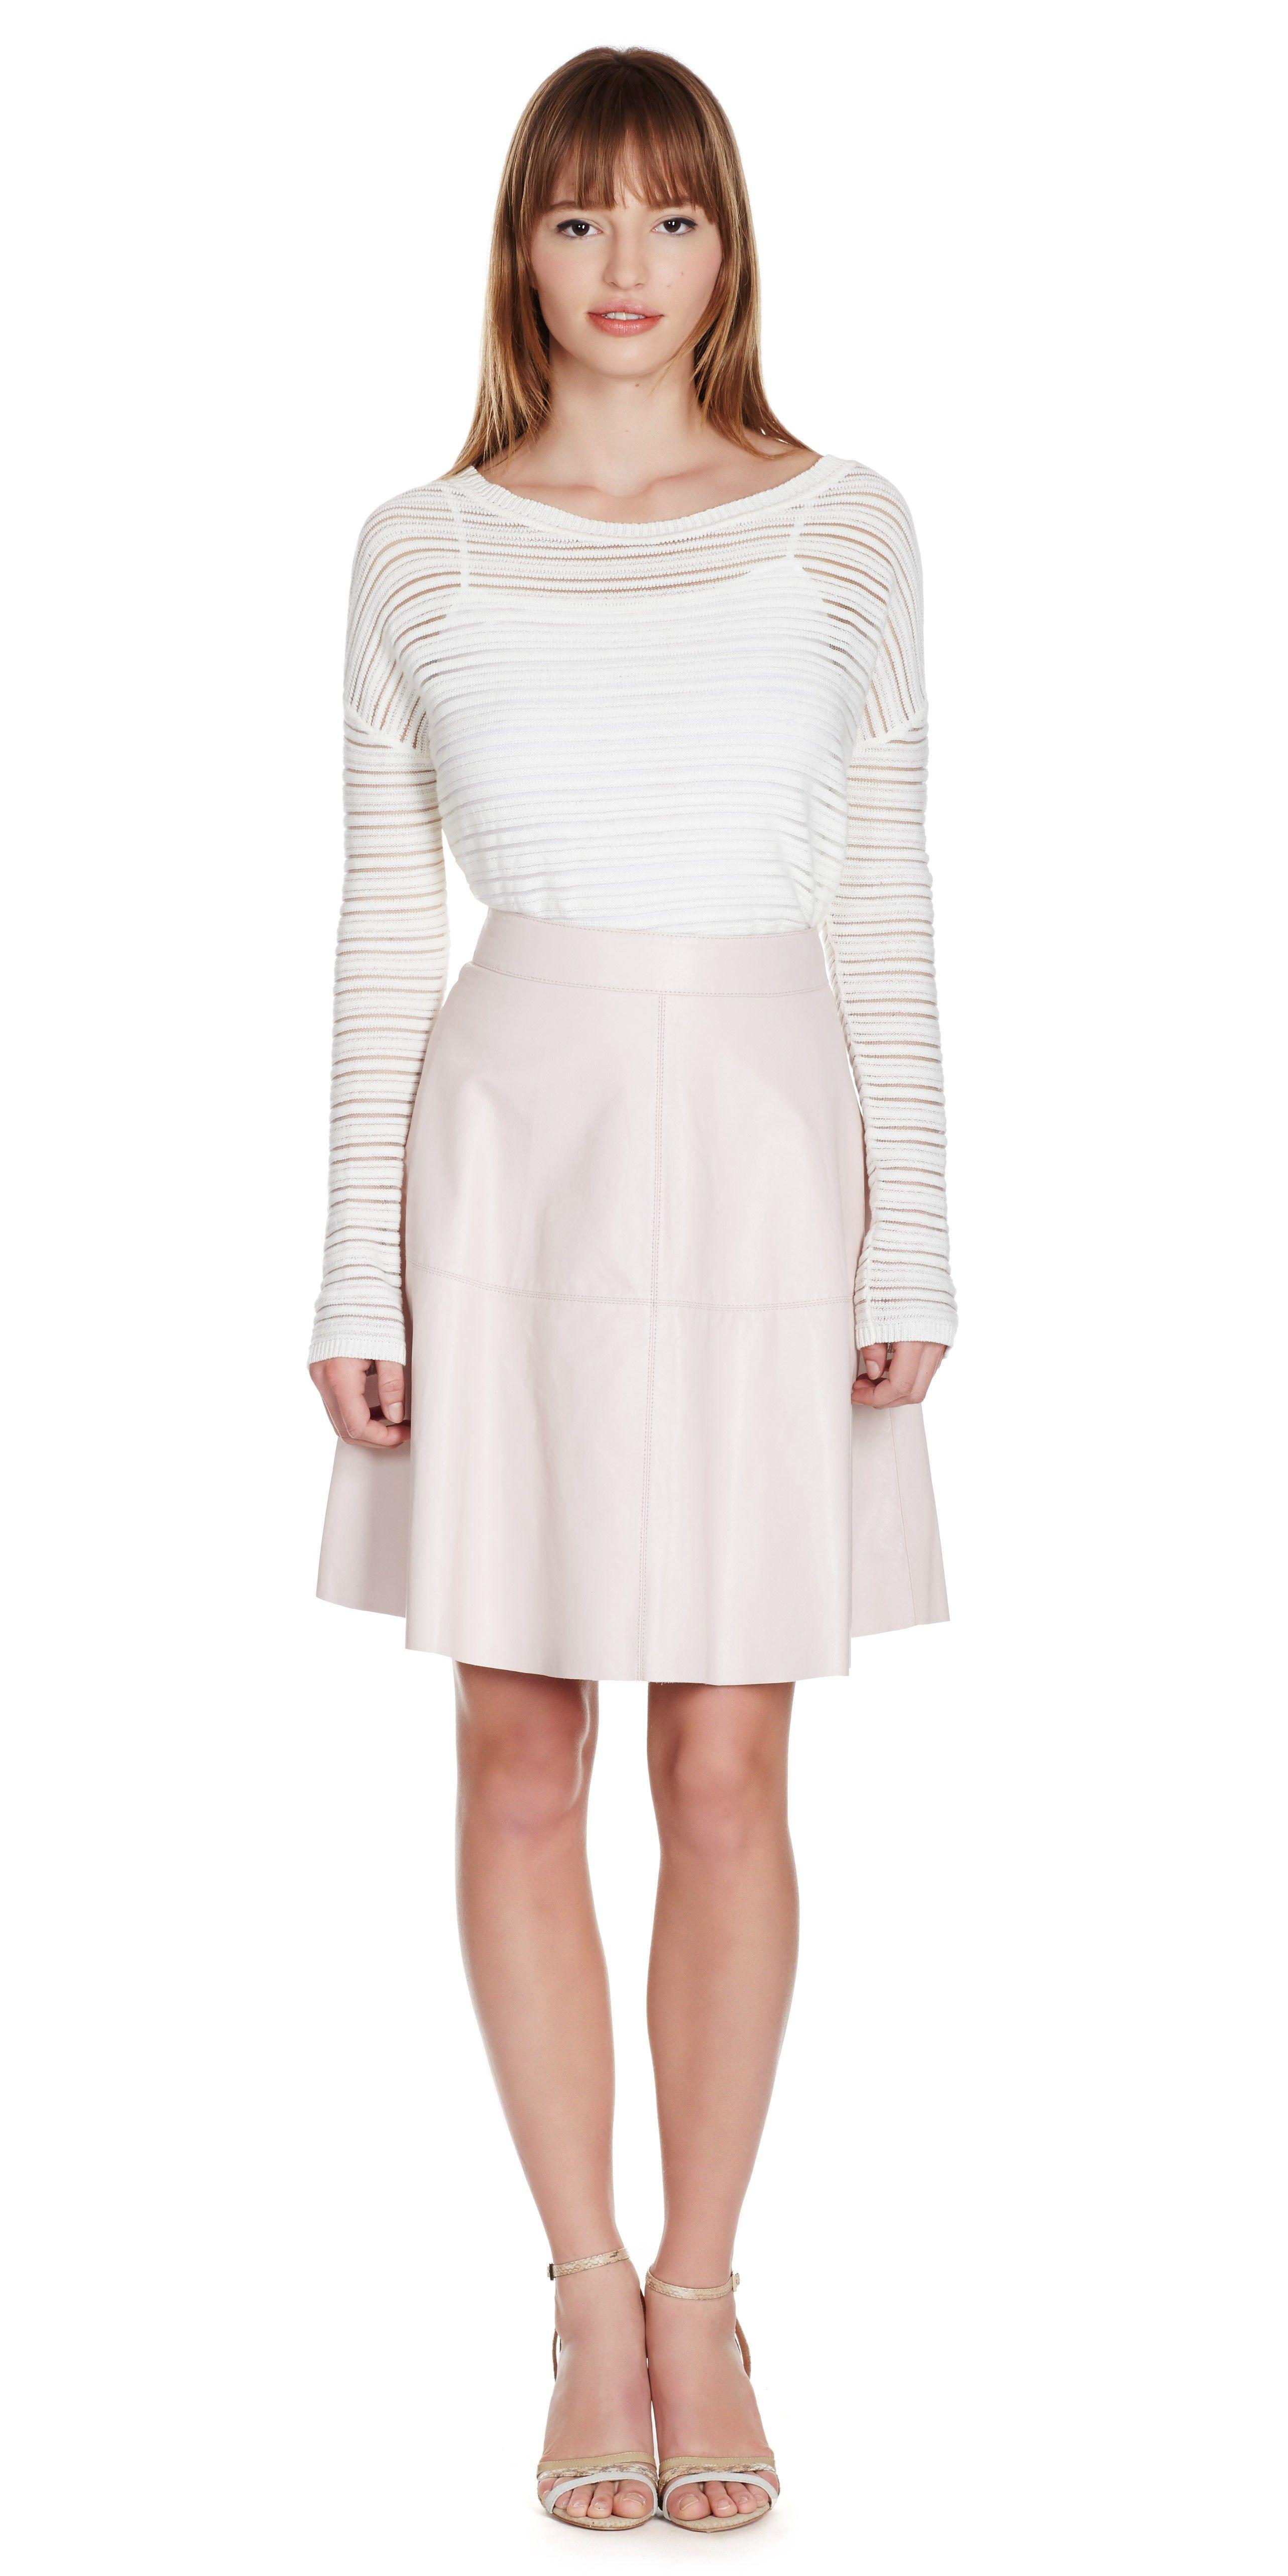 d9bd4210e3 New in for Spring: the JOIE Decollete Skirt #pastel | Now Trending ...